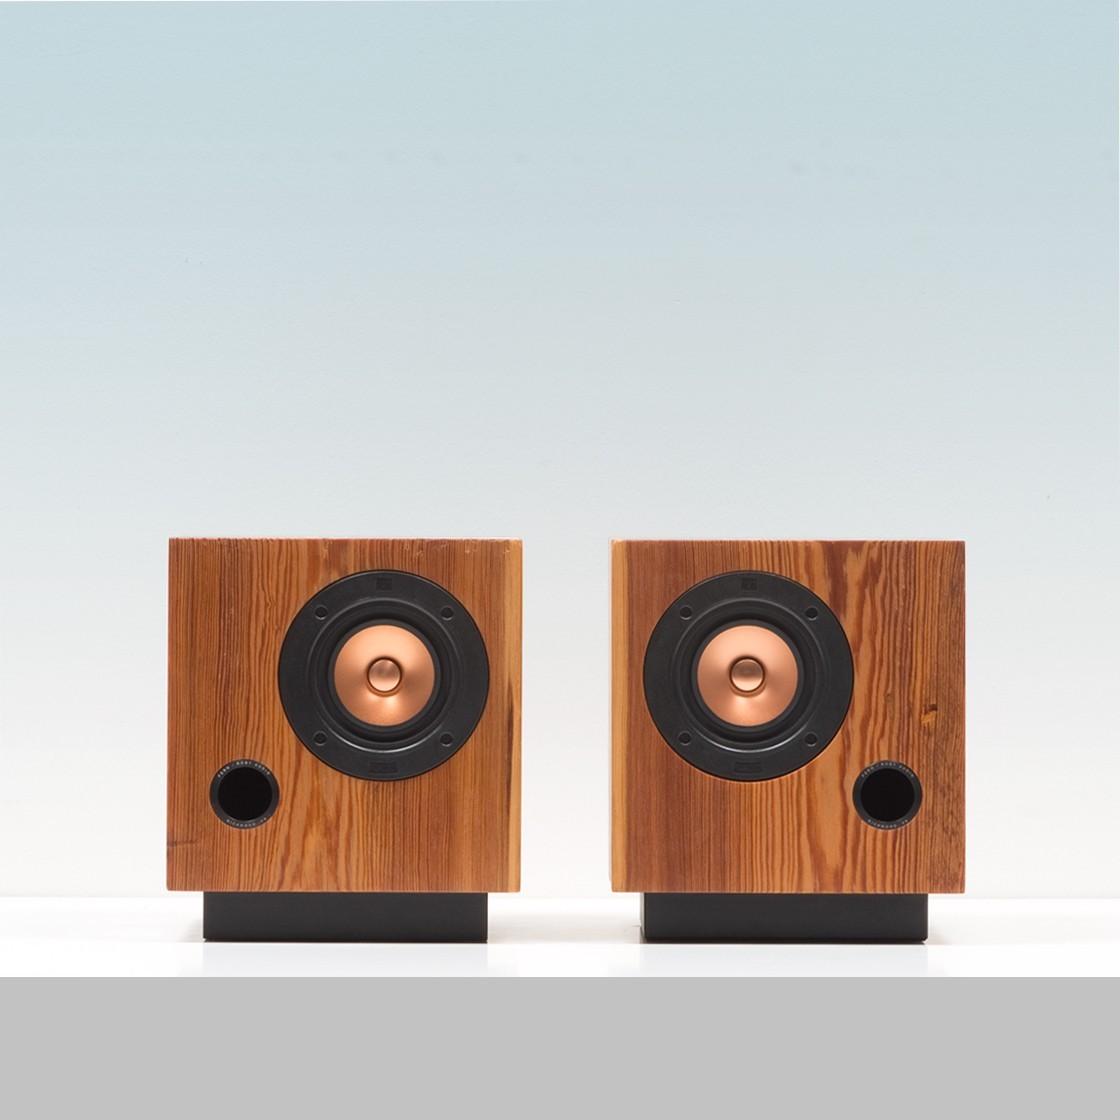 fern & roby cube speakers - design milk